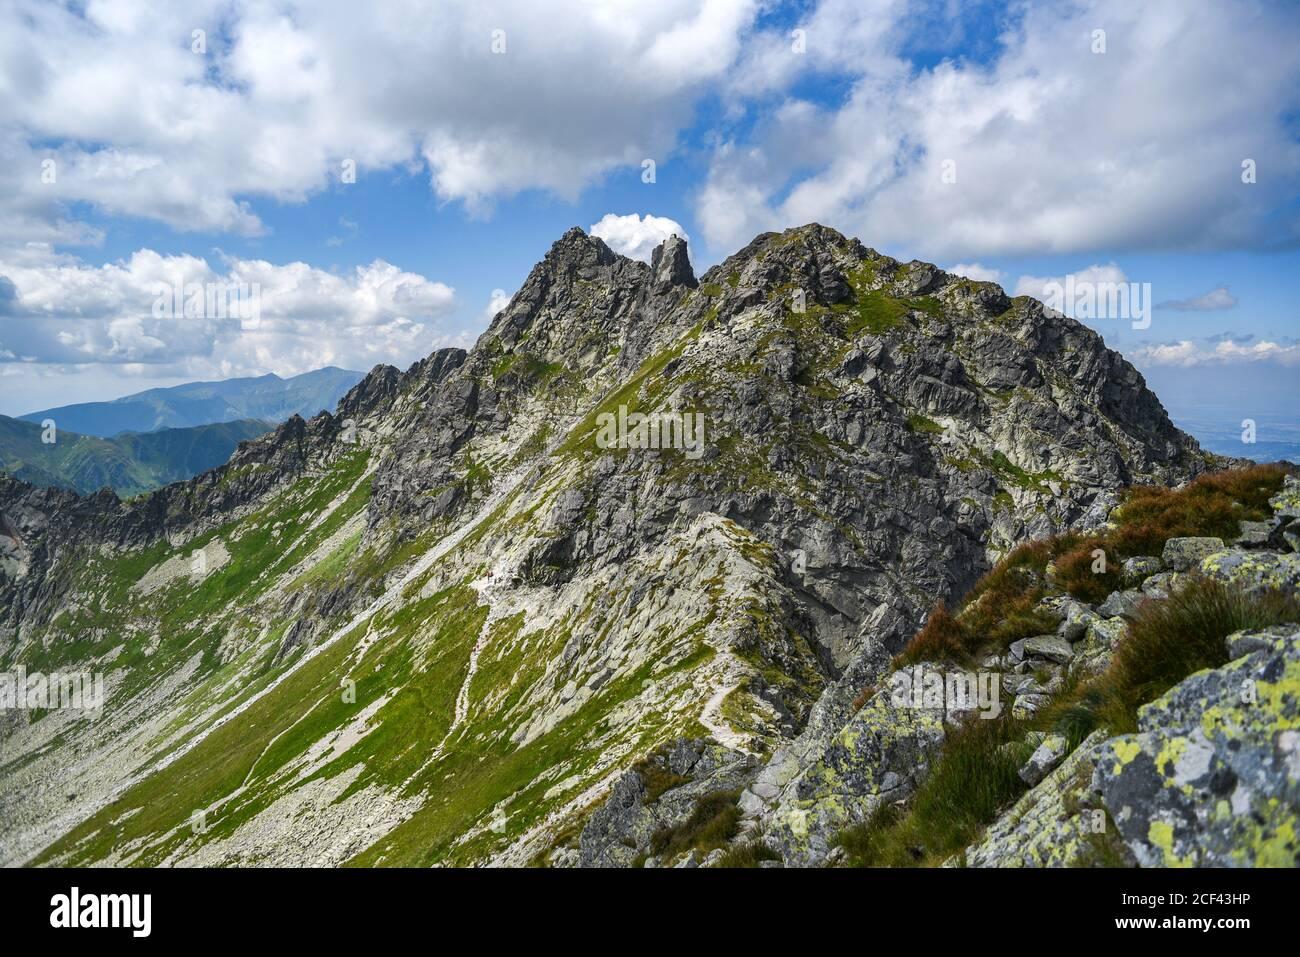 Landscape of Tatra mountains in Poland. Mountain landscape. Stock Photo